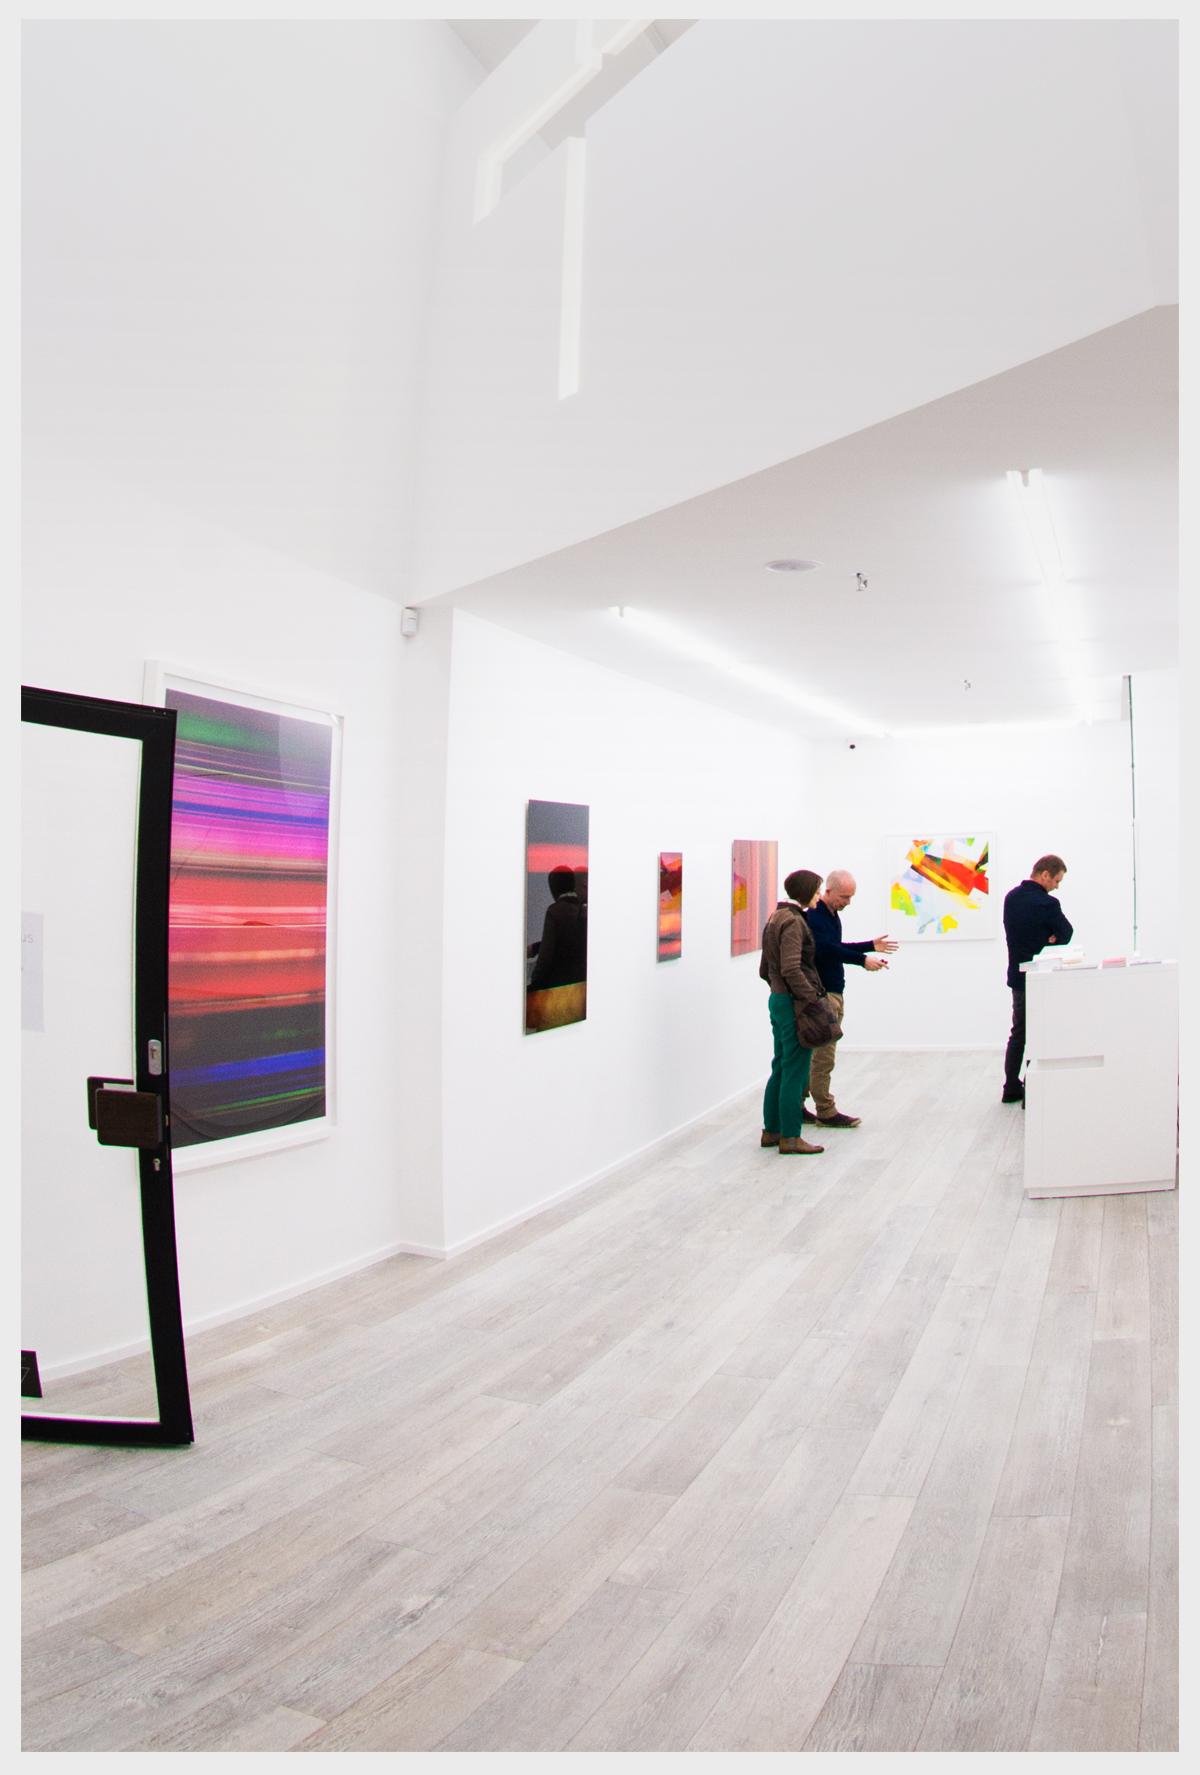 Thisplay.us exhibition, Frederic Robert Georges and Hans Verhaegen, Espace Rivoli, April 2016, Brussels.